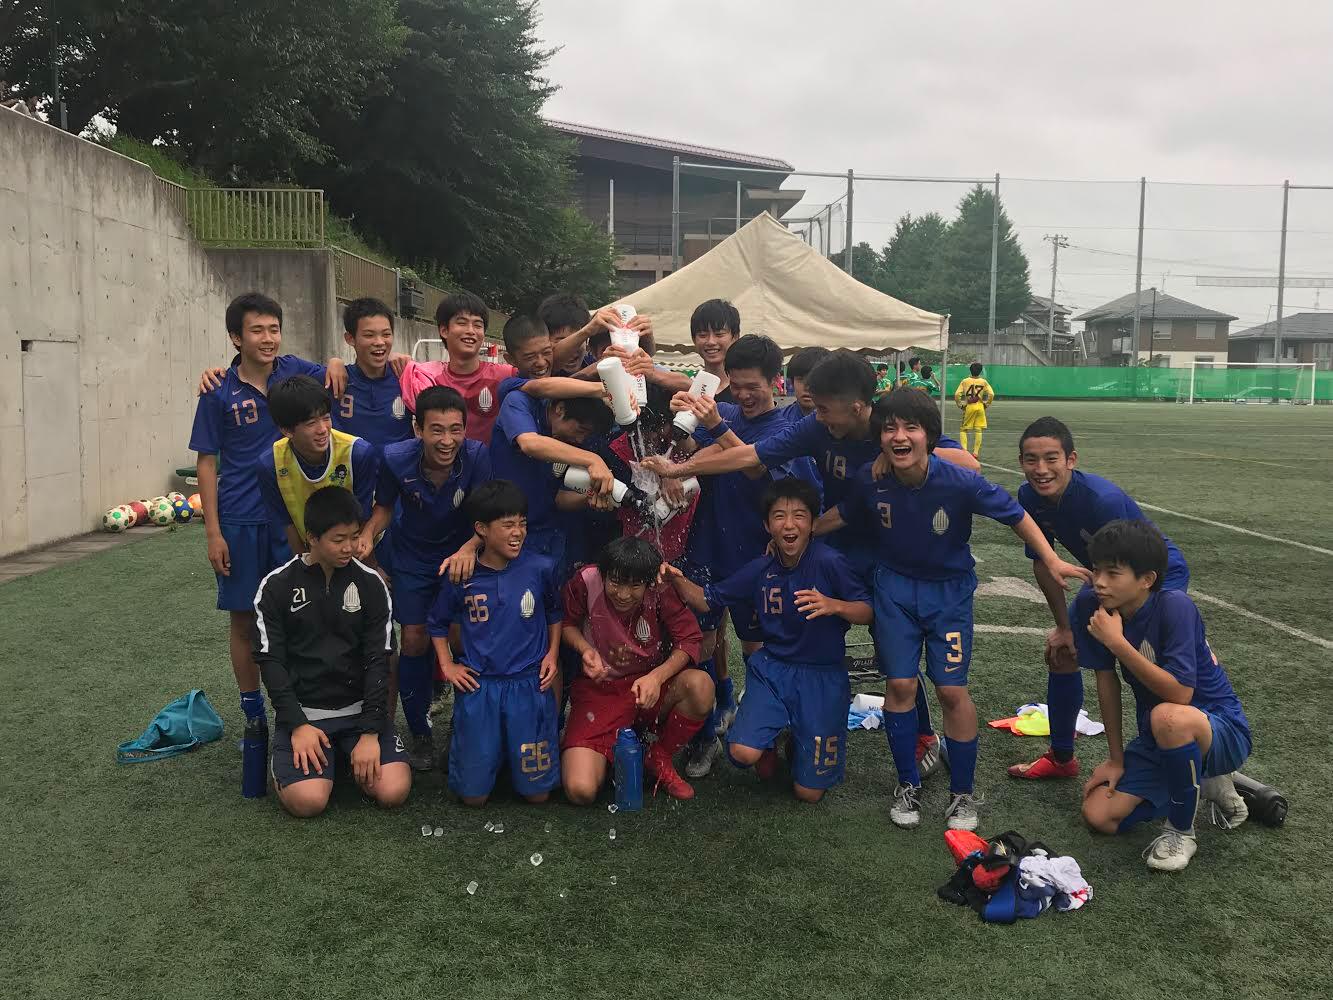 【U15】高円宮杯 U-15サッカー千葉県1部リーグ 第15節